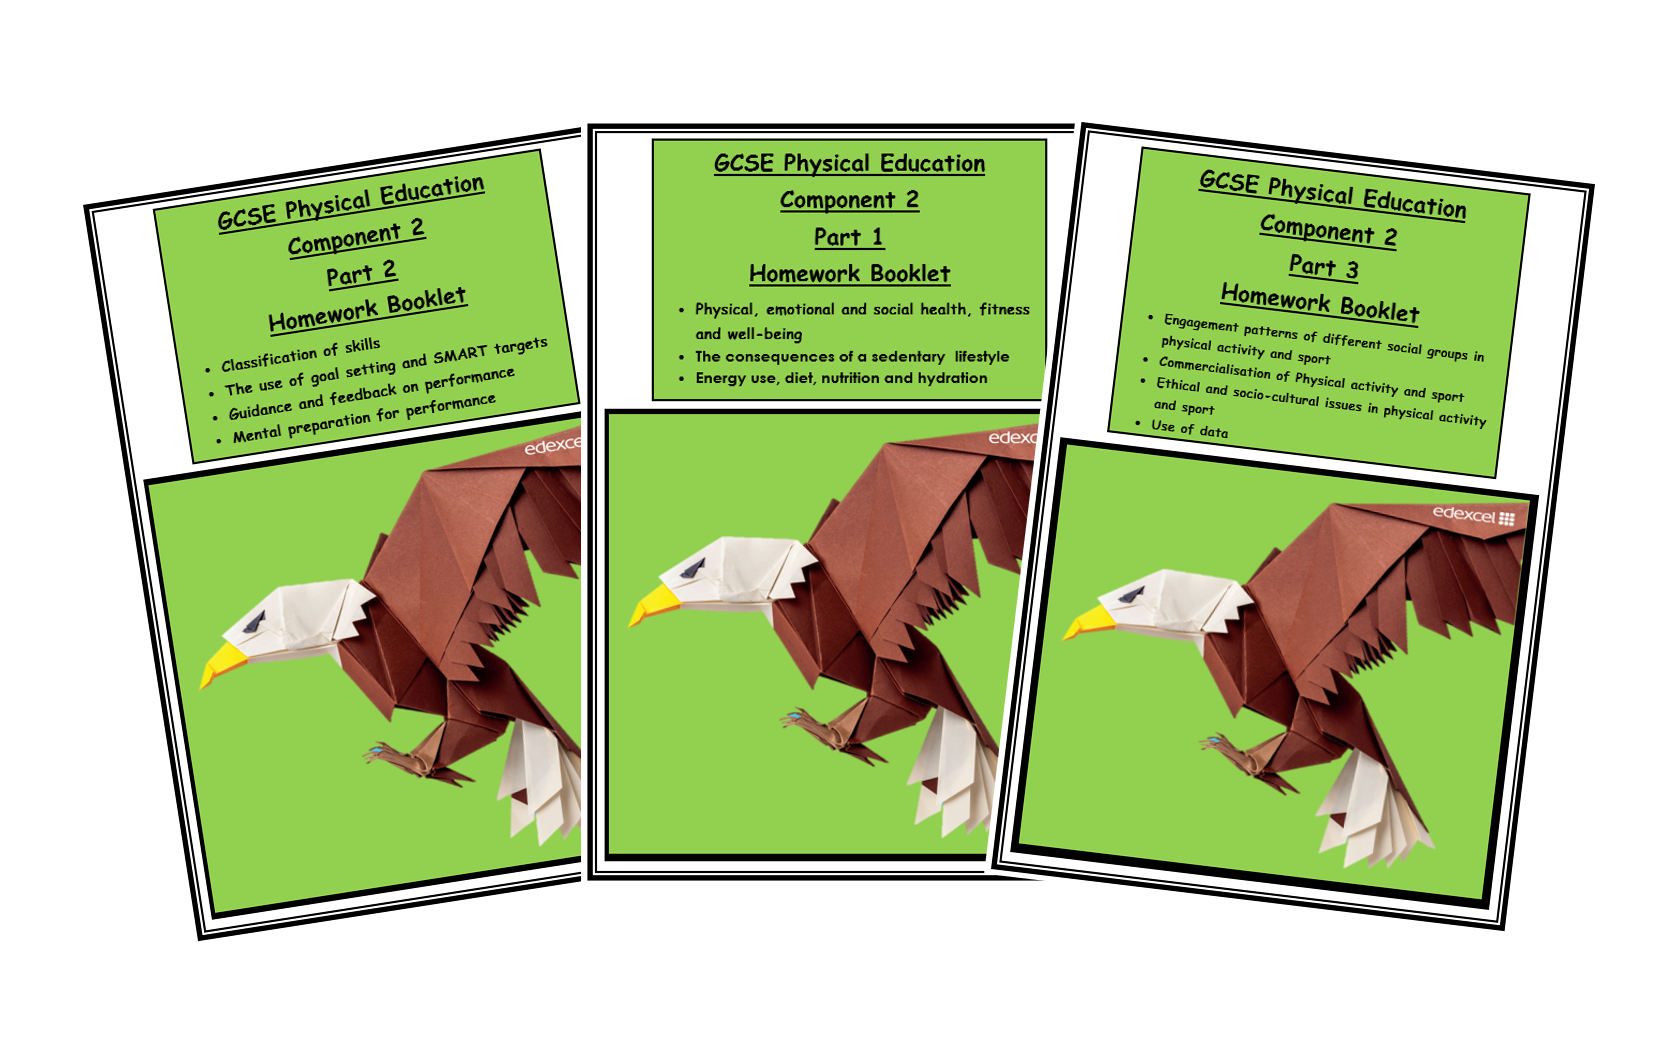 Edexcel GCSE PE - Homework Booklets for Component 2